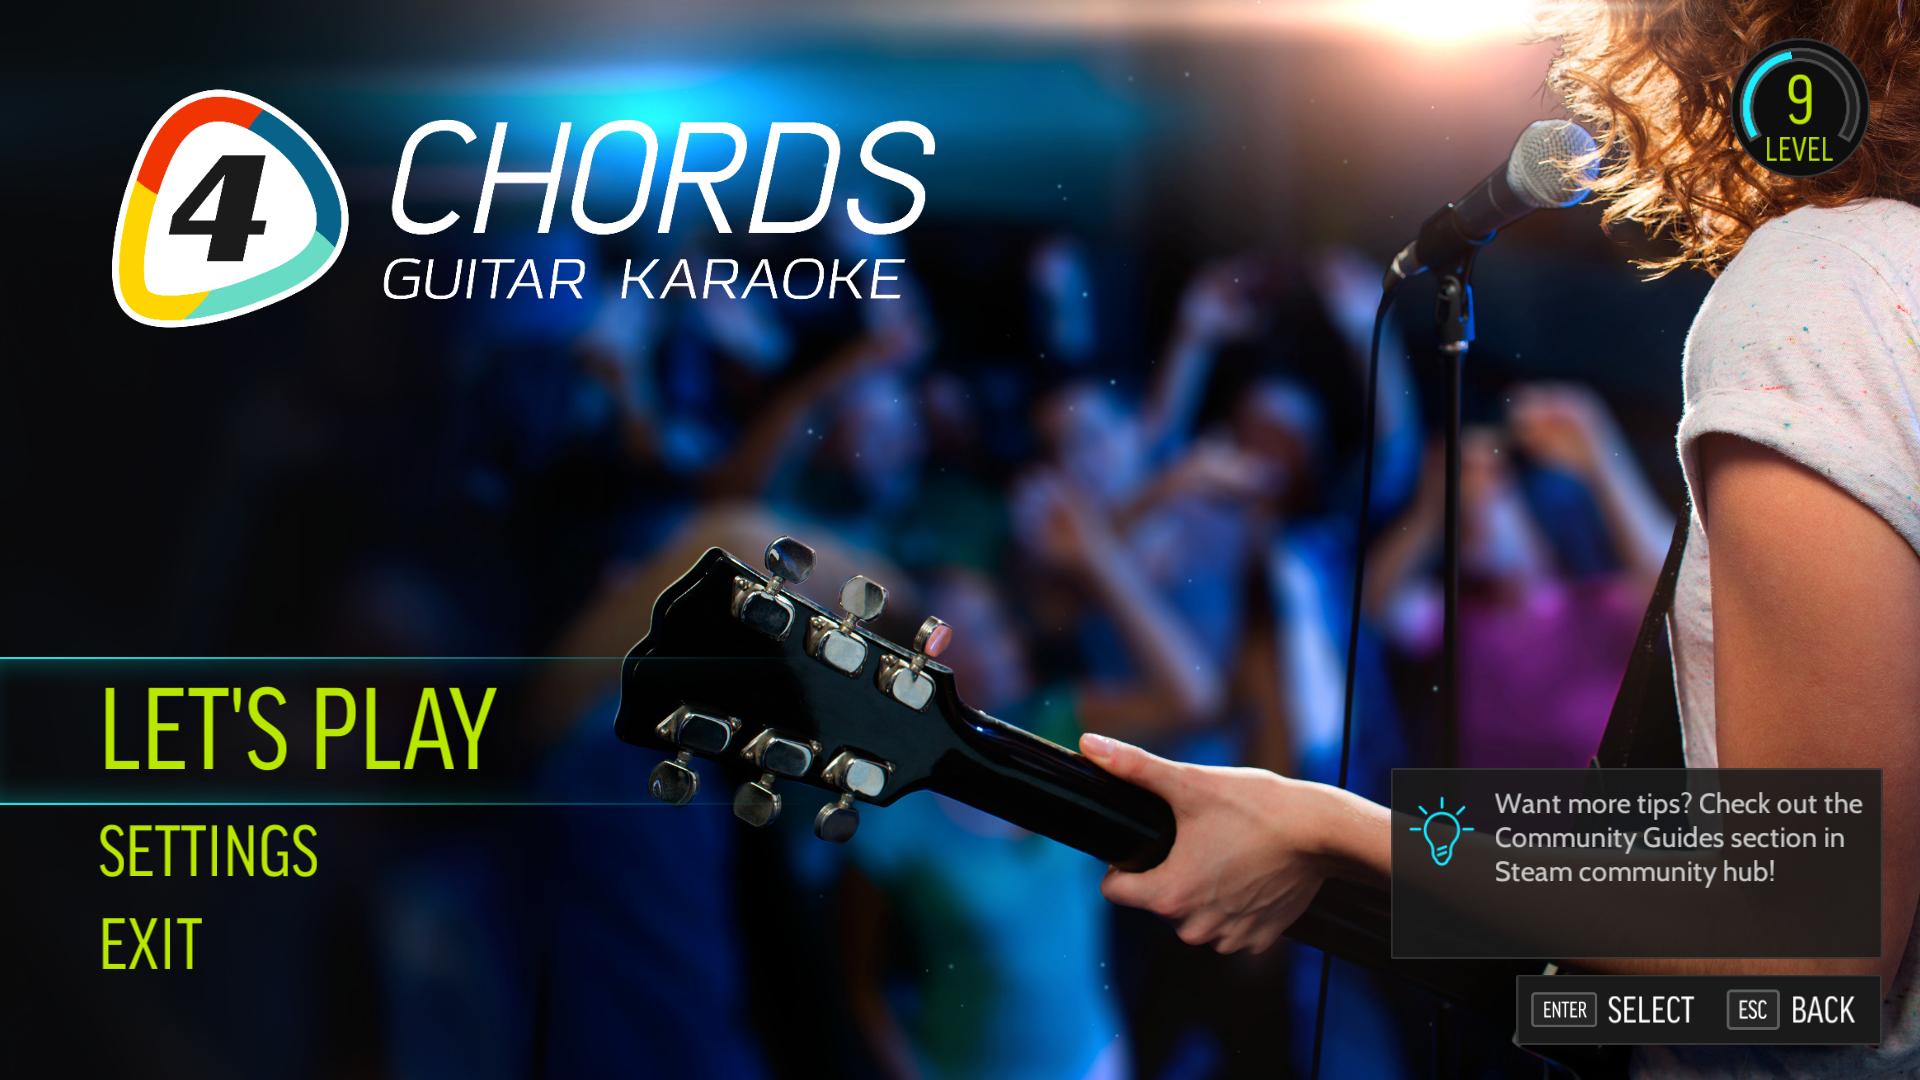 Fourchords Guitar Karaoke Demi Lovato Song Pack On Steam